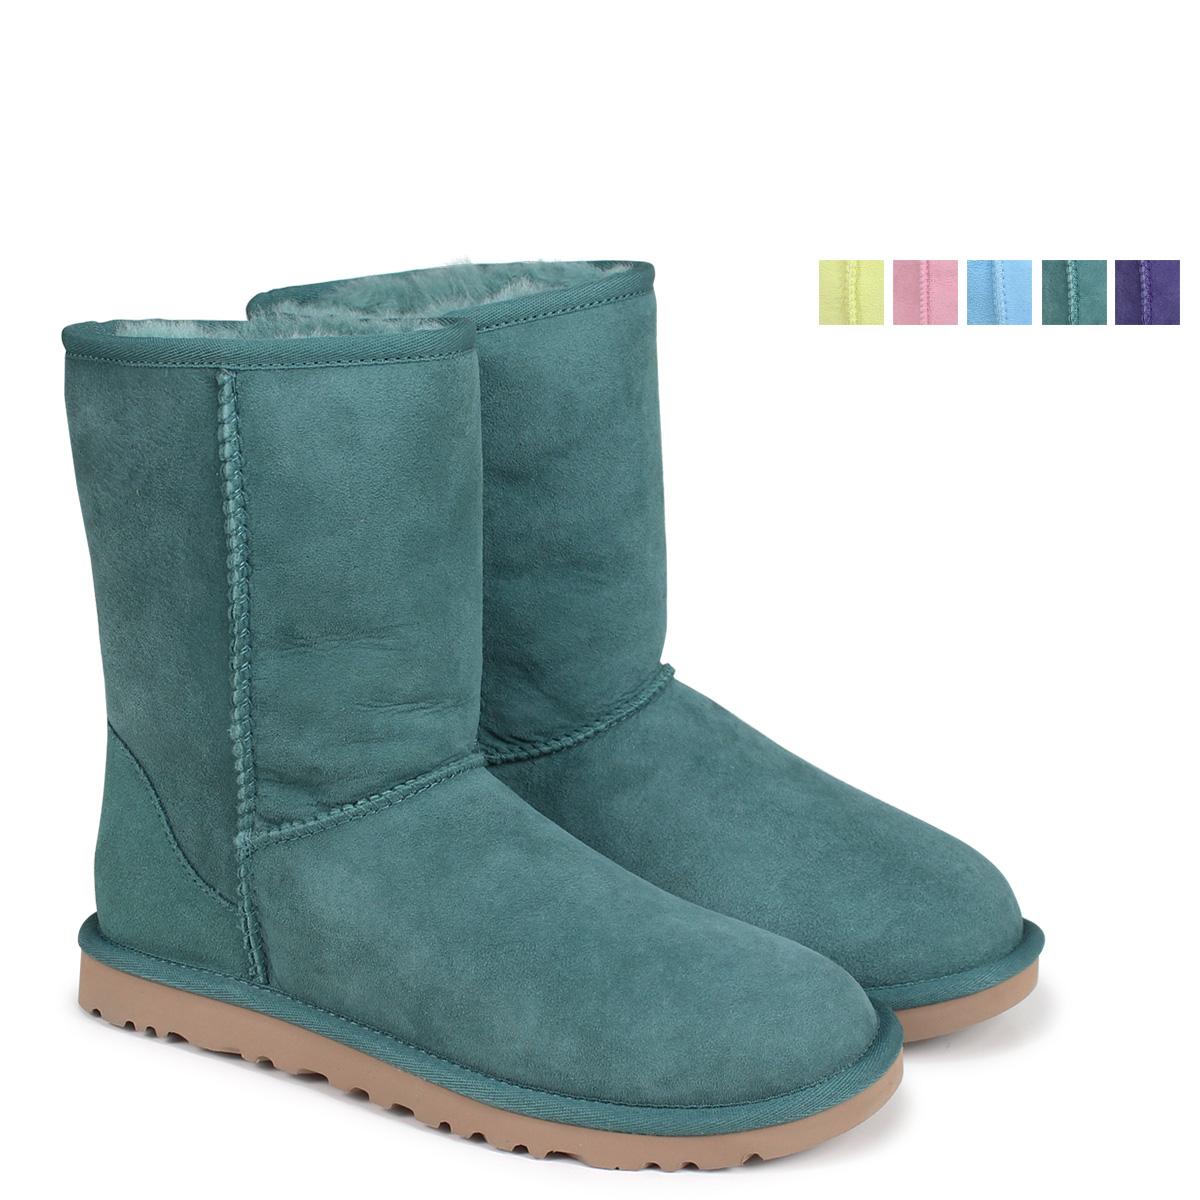 594e79283fa アグ UGG classical music short mouton boots WOMENS CLASSIC SHORT 5825  sheepskin Lady's